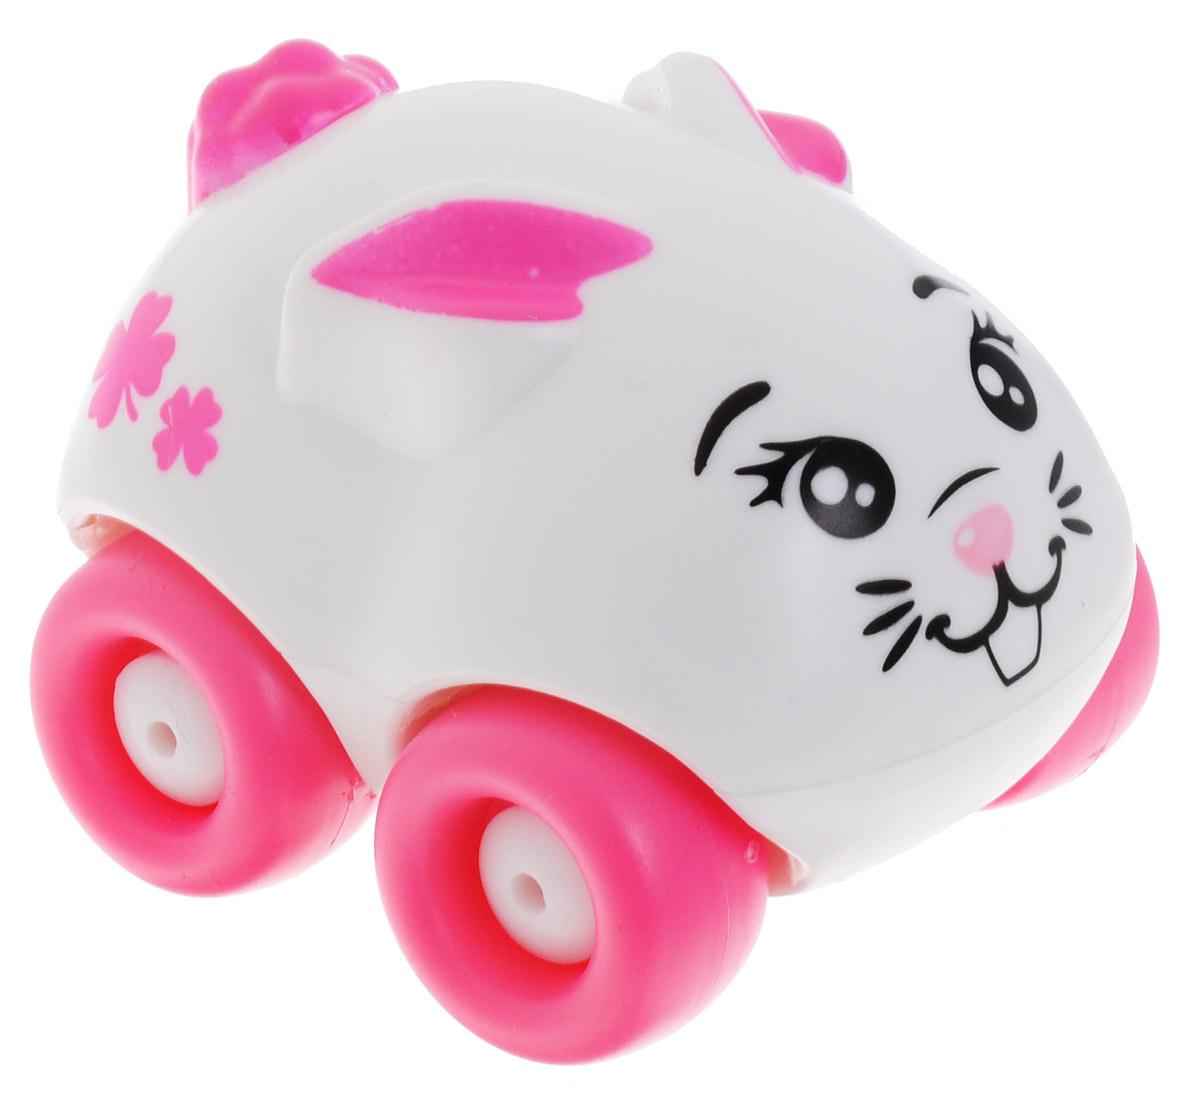 Машинка Smoby Animal Planet: Зайчик, цвет: белый, розовый smoby машинка animal planet smoby оранжевая